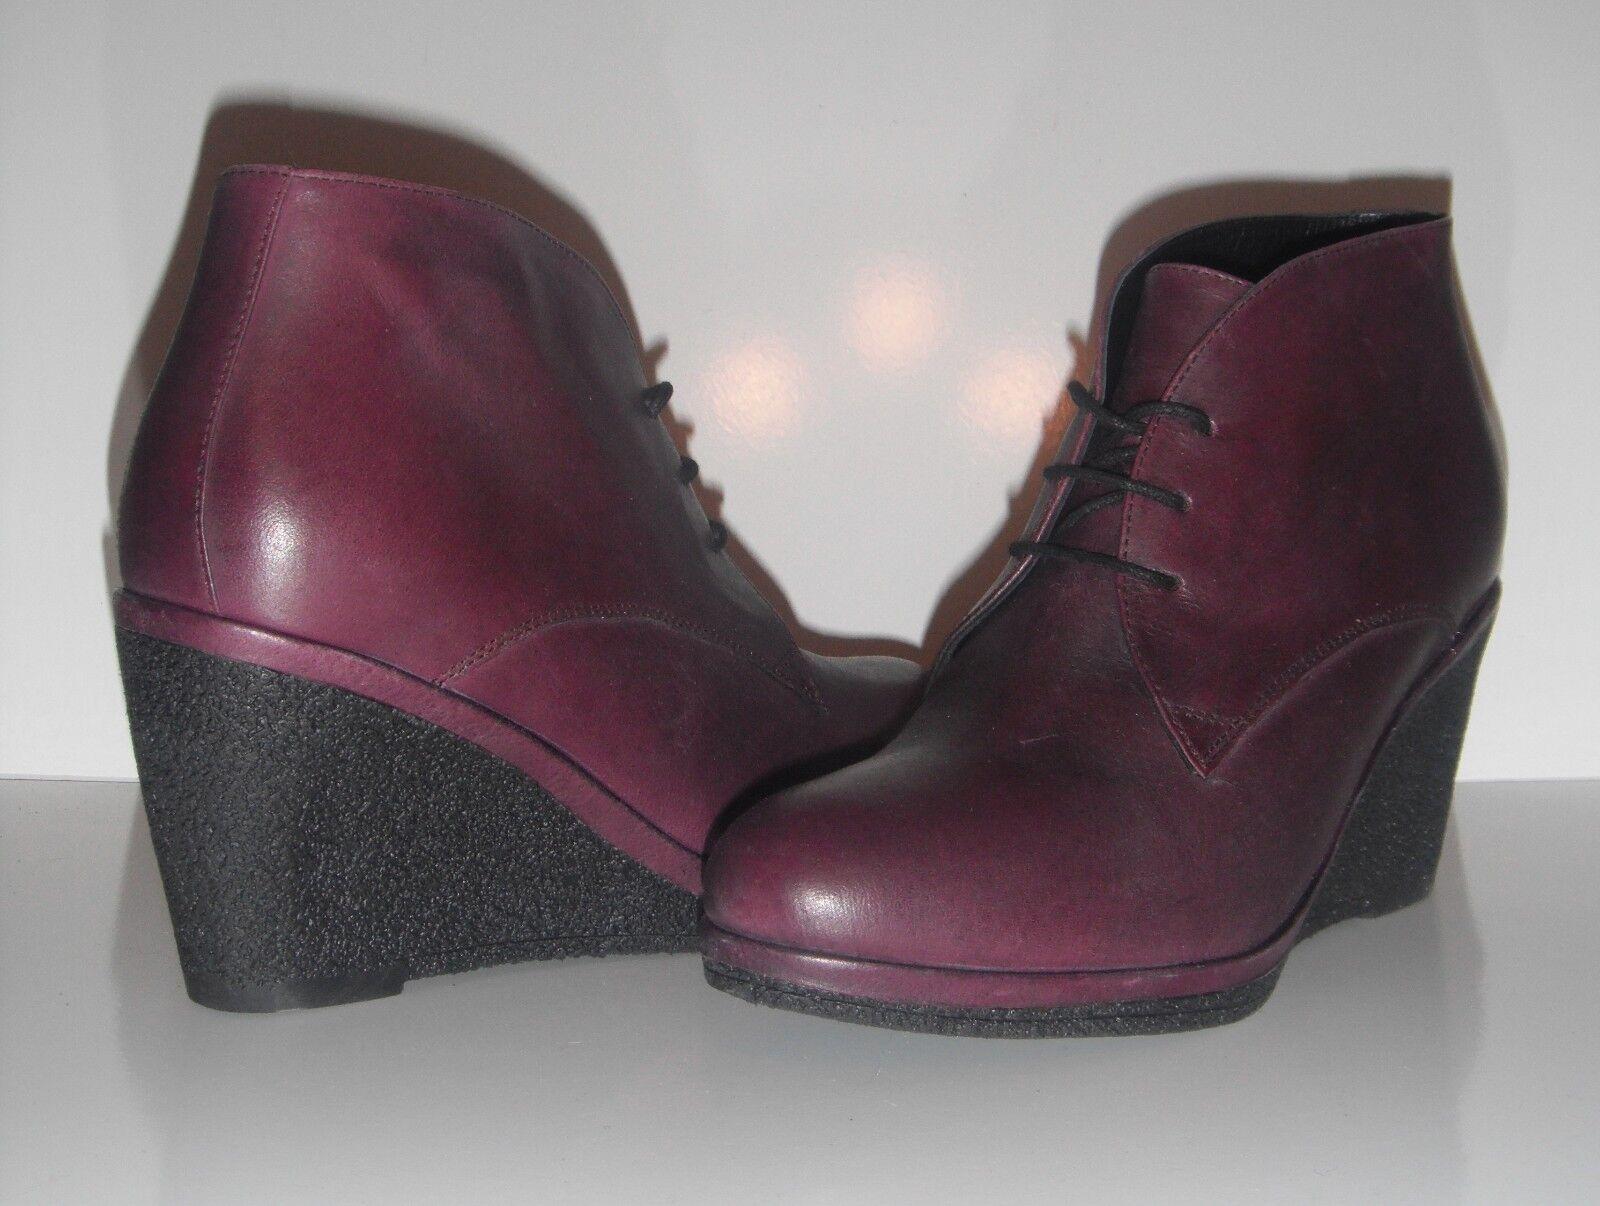 NEU Vanilla Moon Viola Bordo Leder Wedge Heel Ankle Stiefel sz 6.5 200+ Classy